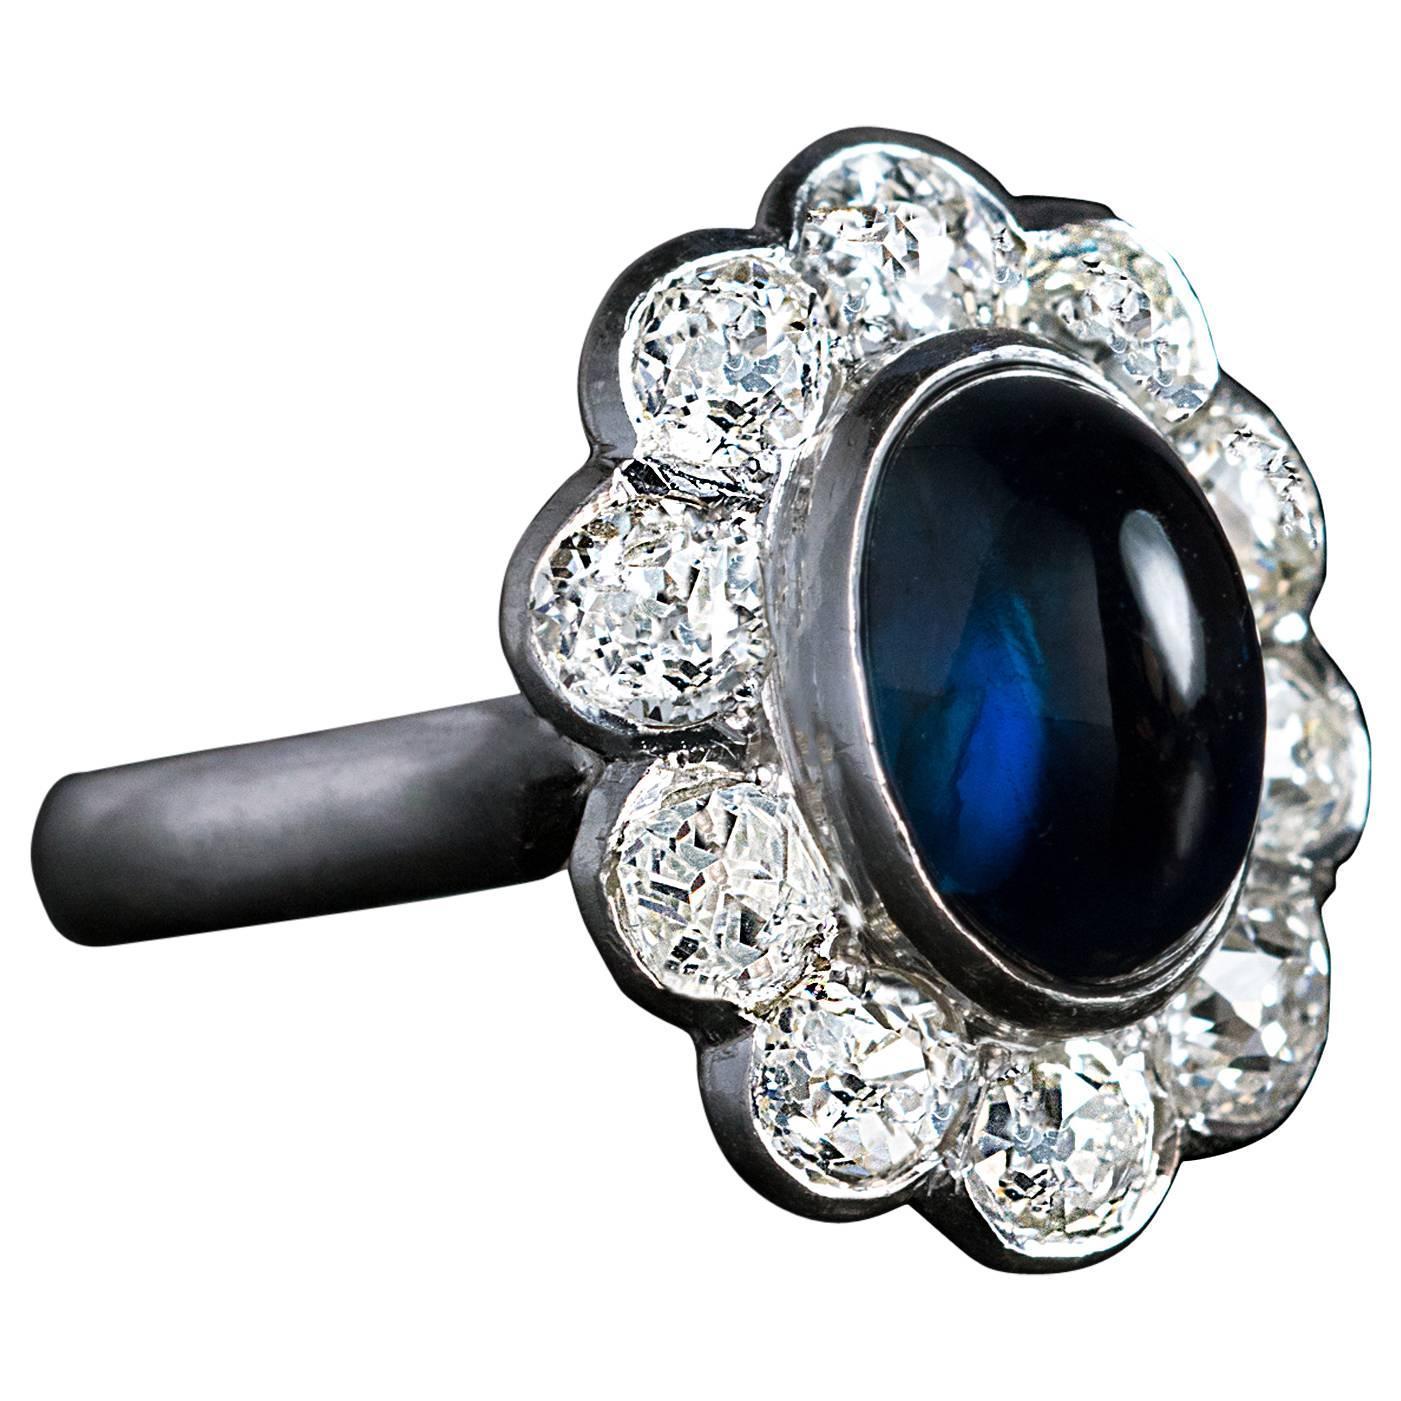 Gemstone Engagement Rings Chicago: Cabochon Sapphire Diamond Platinum Engagement Ring For